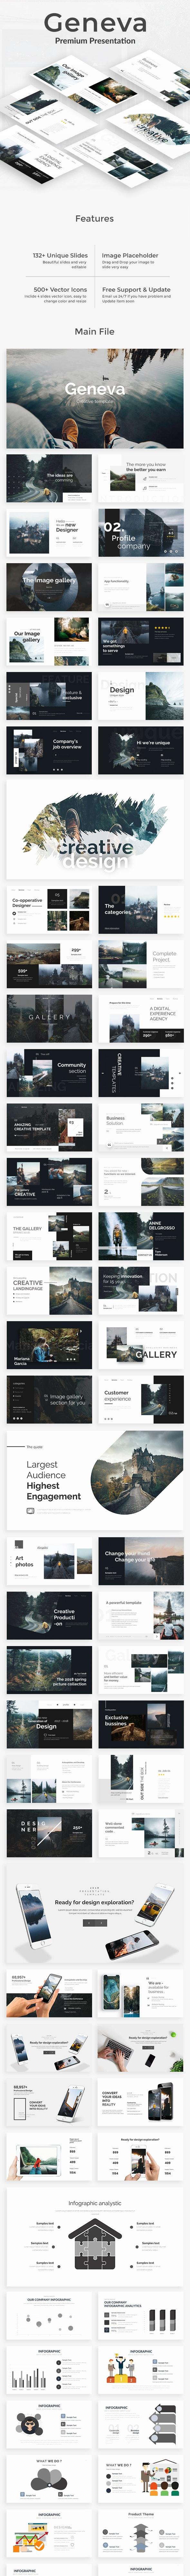 Geneva Creative Powerpoint Template - Creative PowerPoint Templates